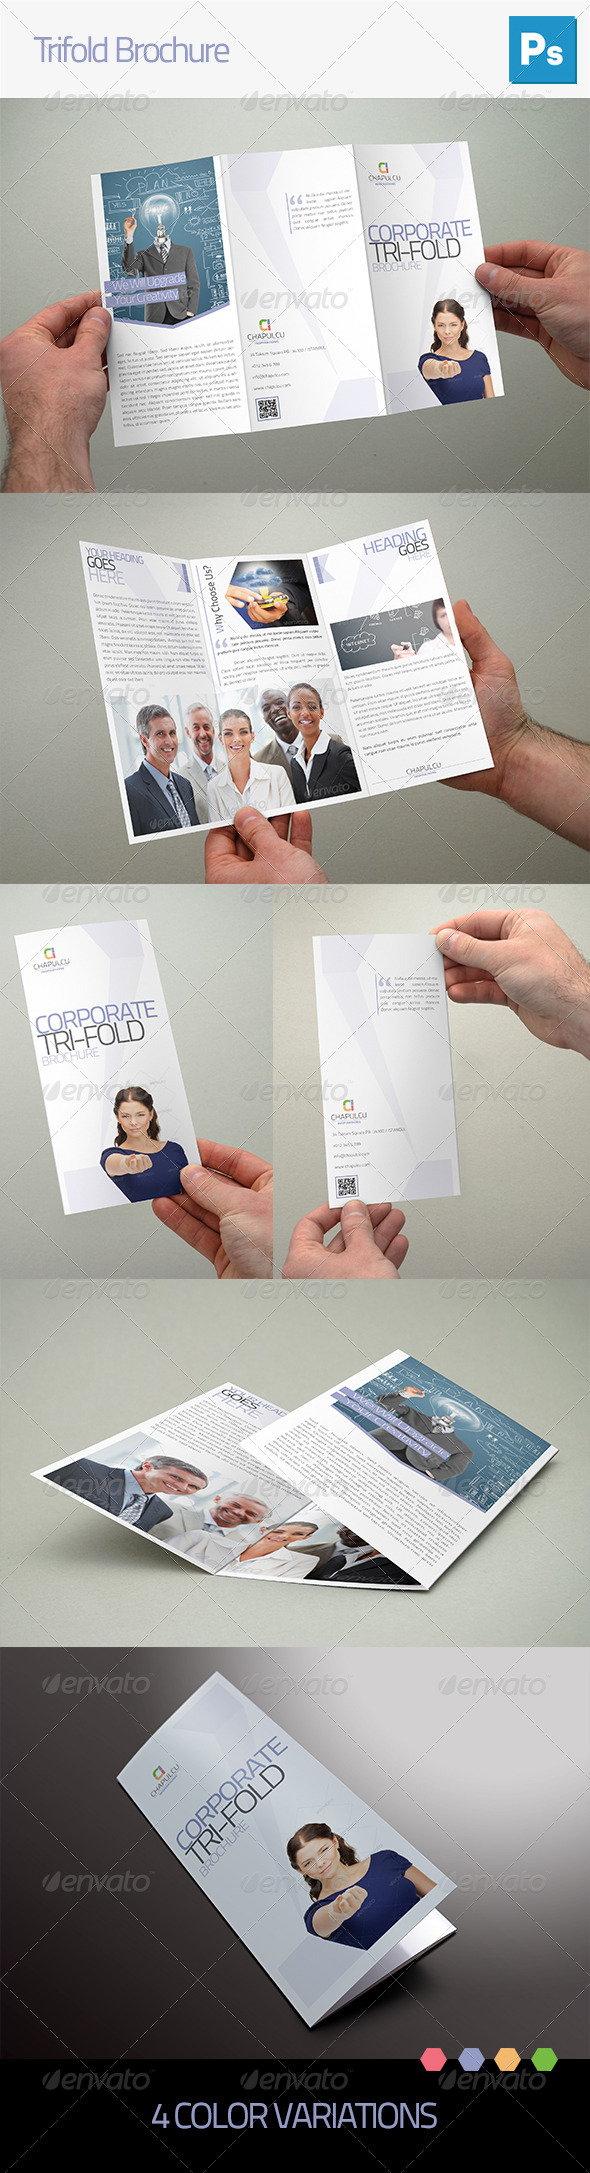 GraphicRiver Trifold Brochure 5069455